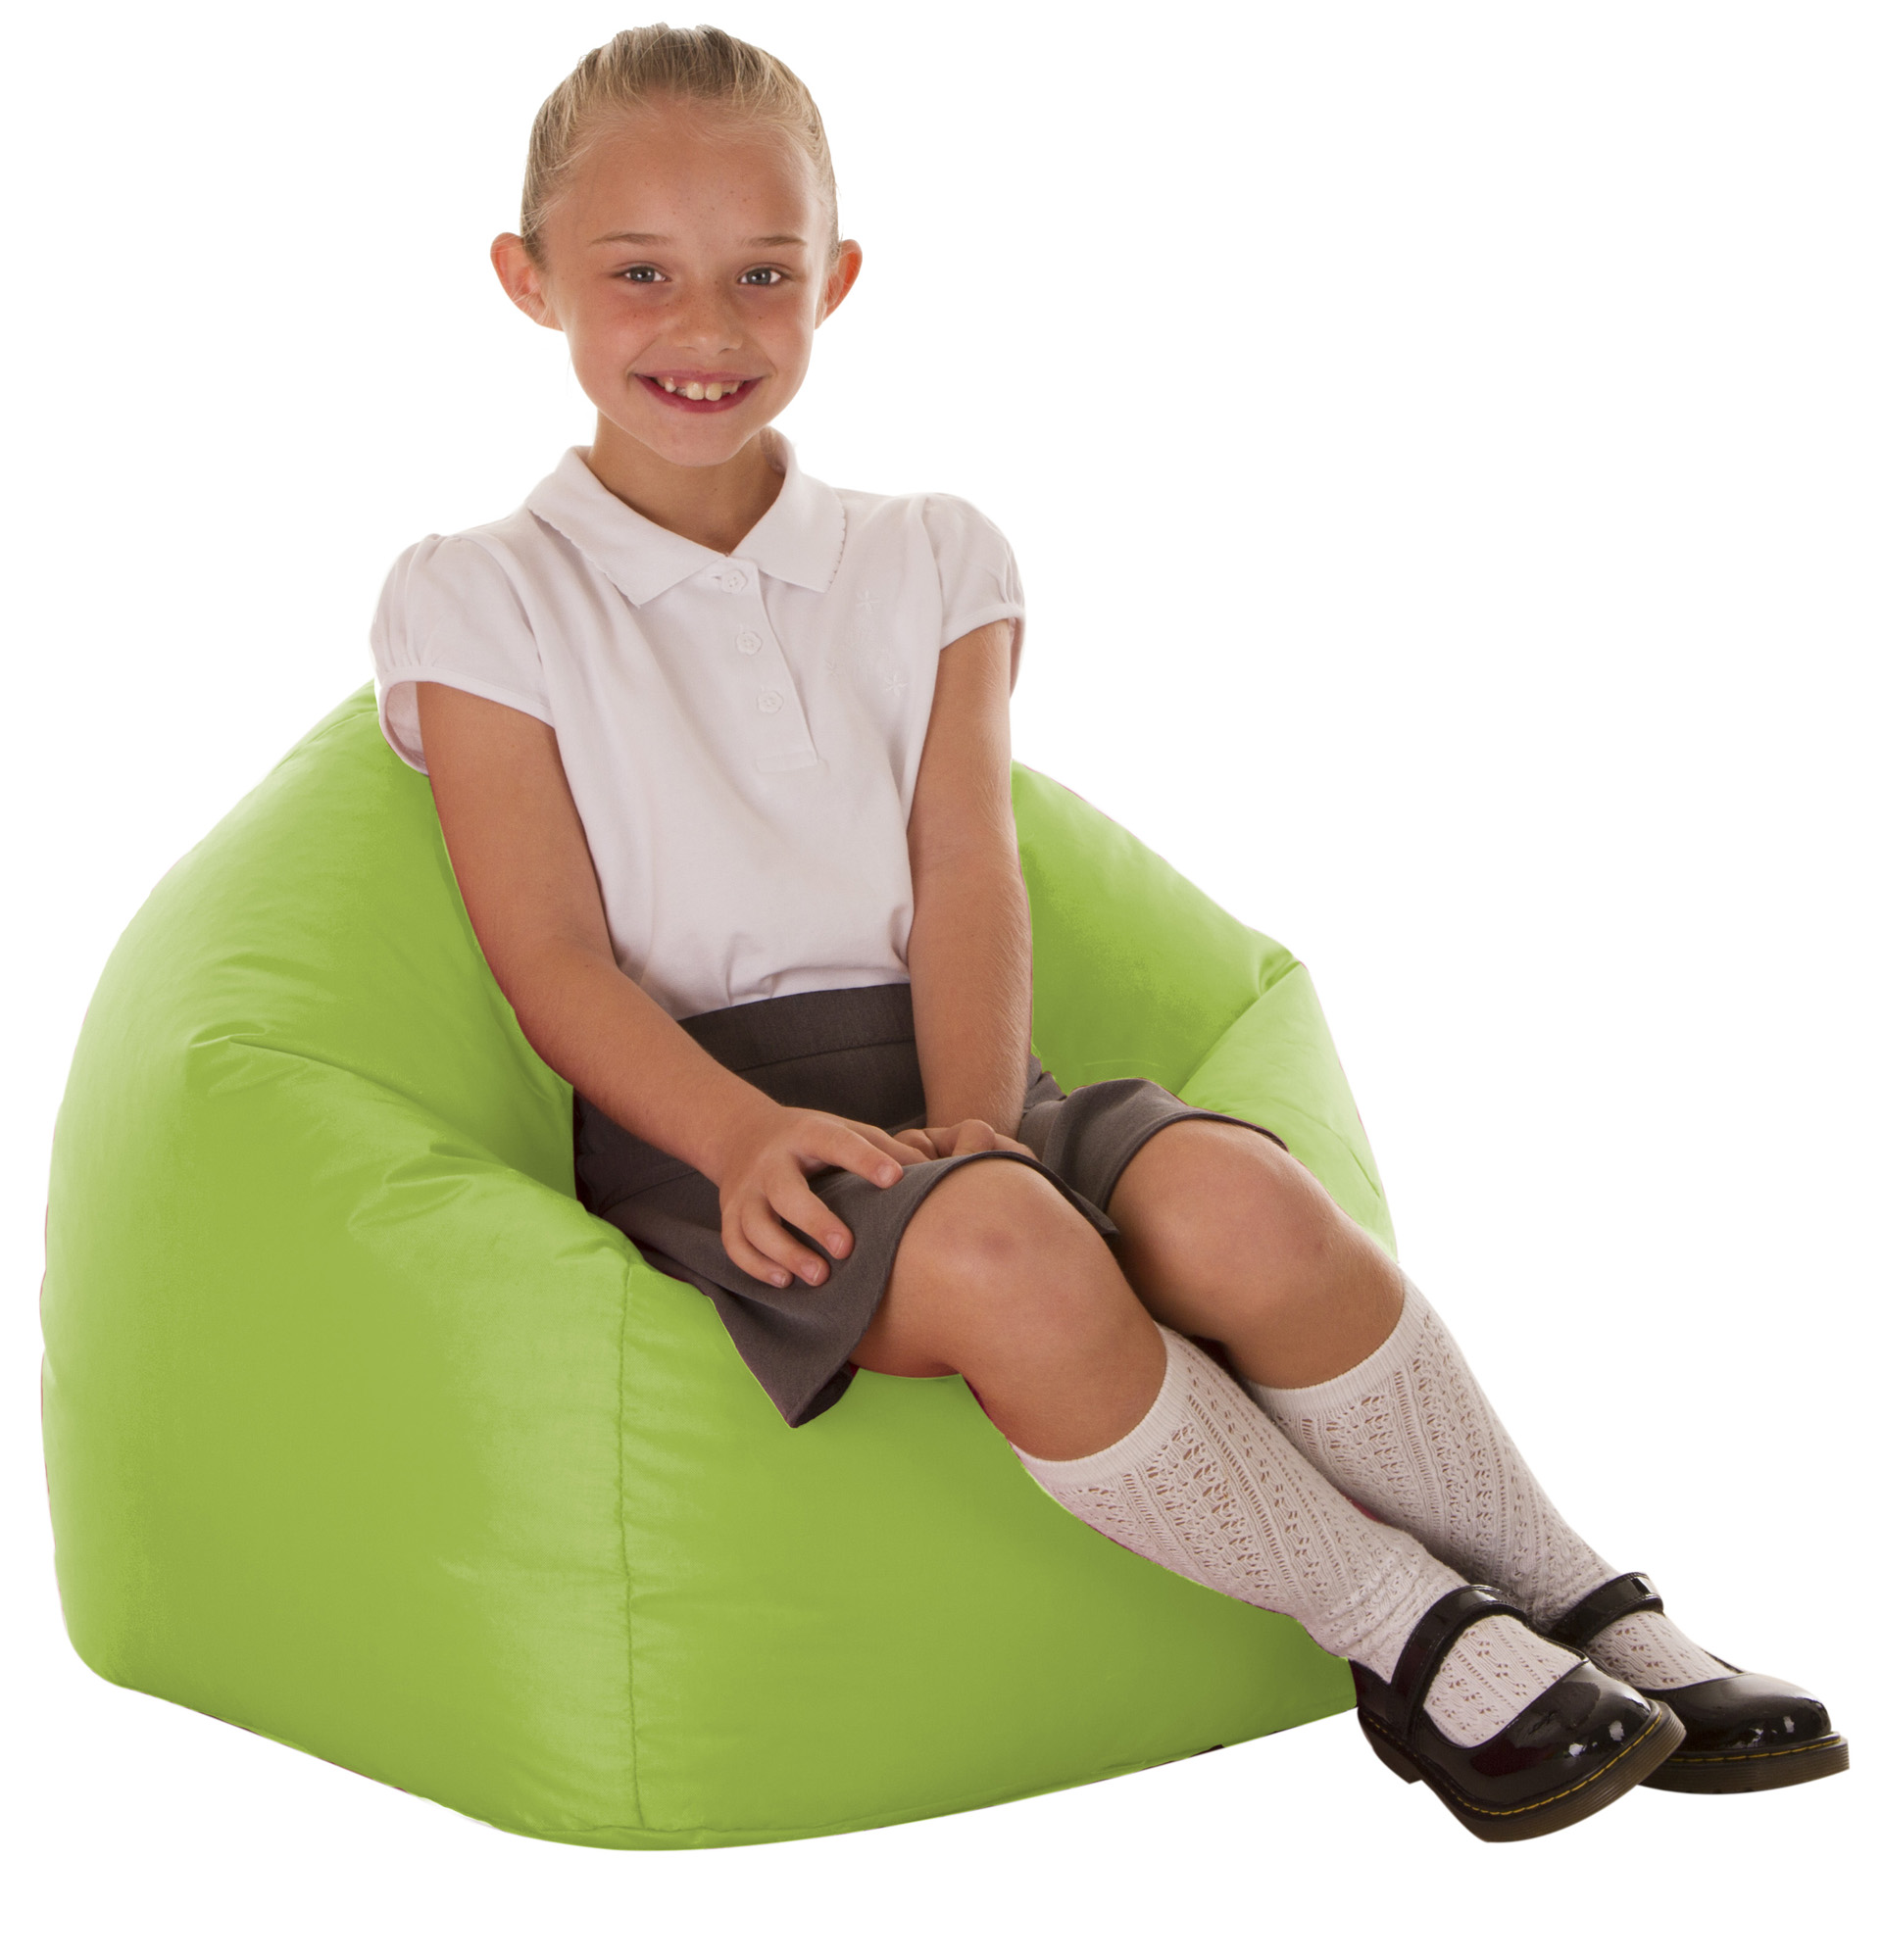 Eden-Primary-Bean-Bag-Lime-300dpi-2